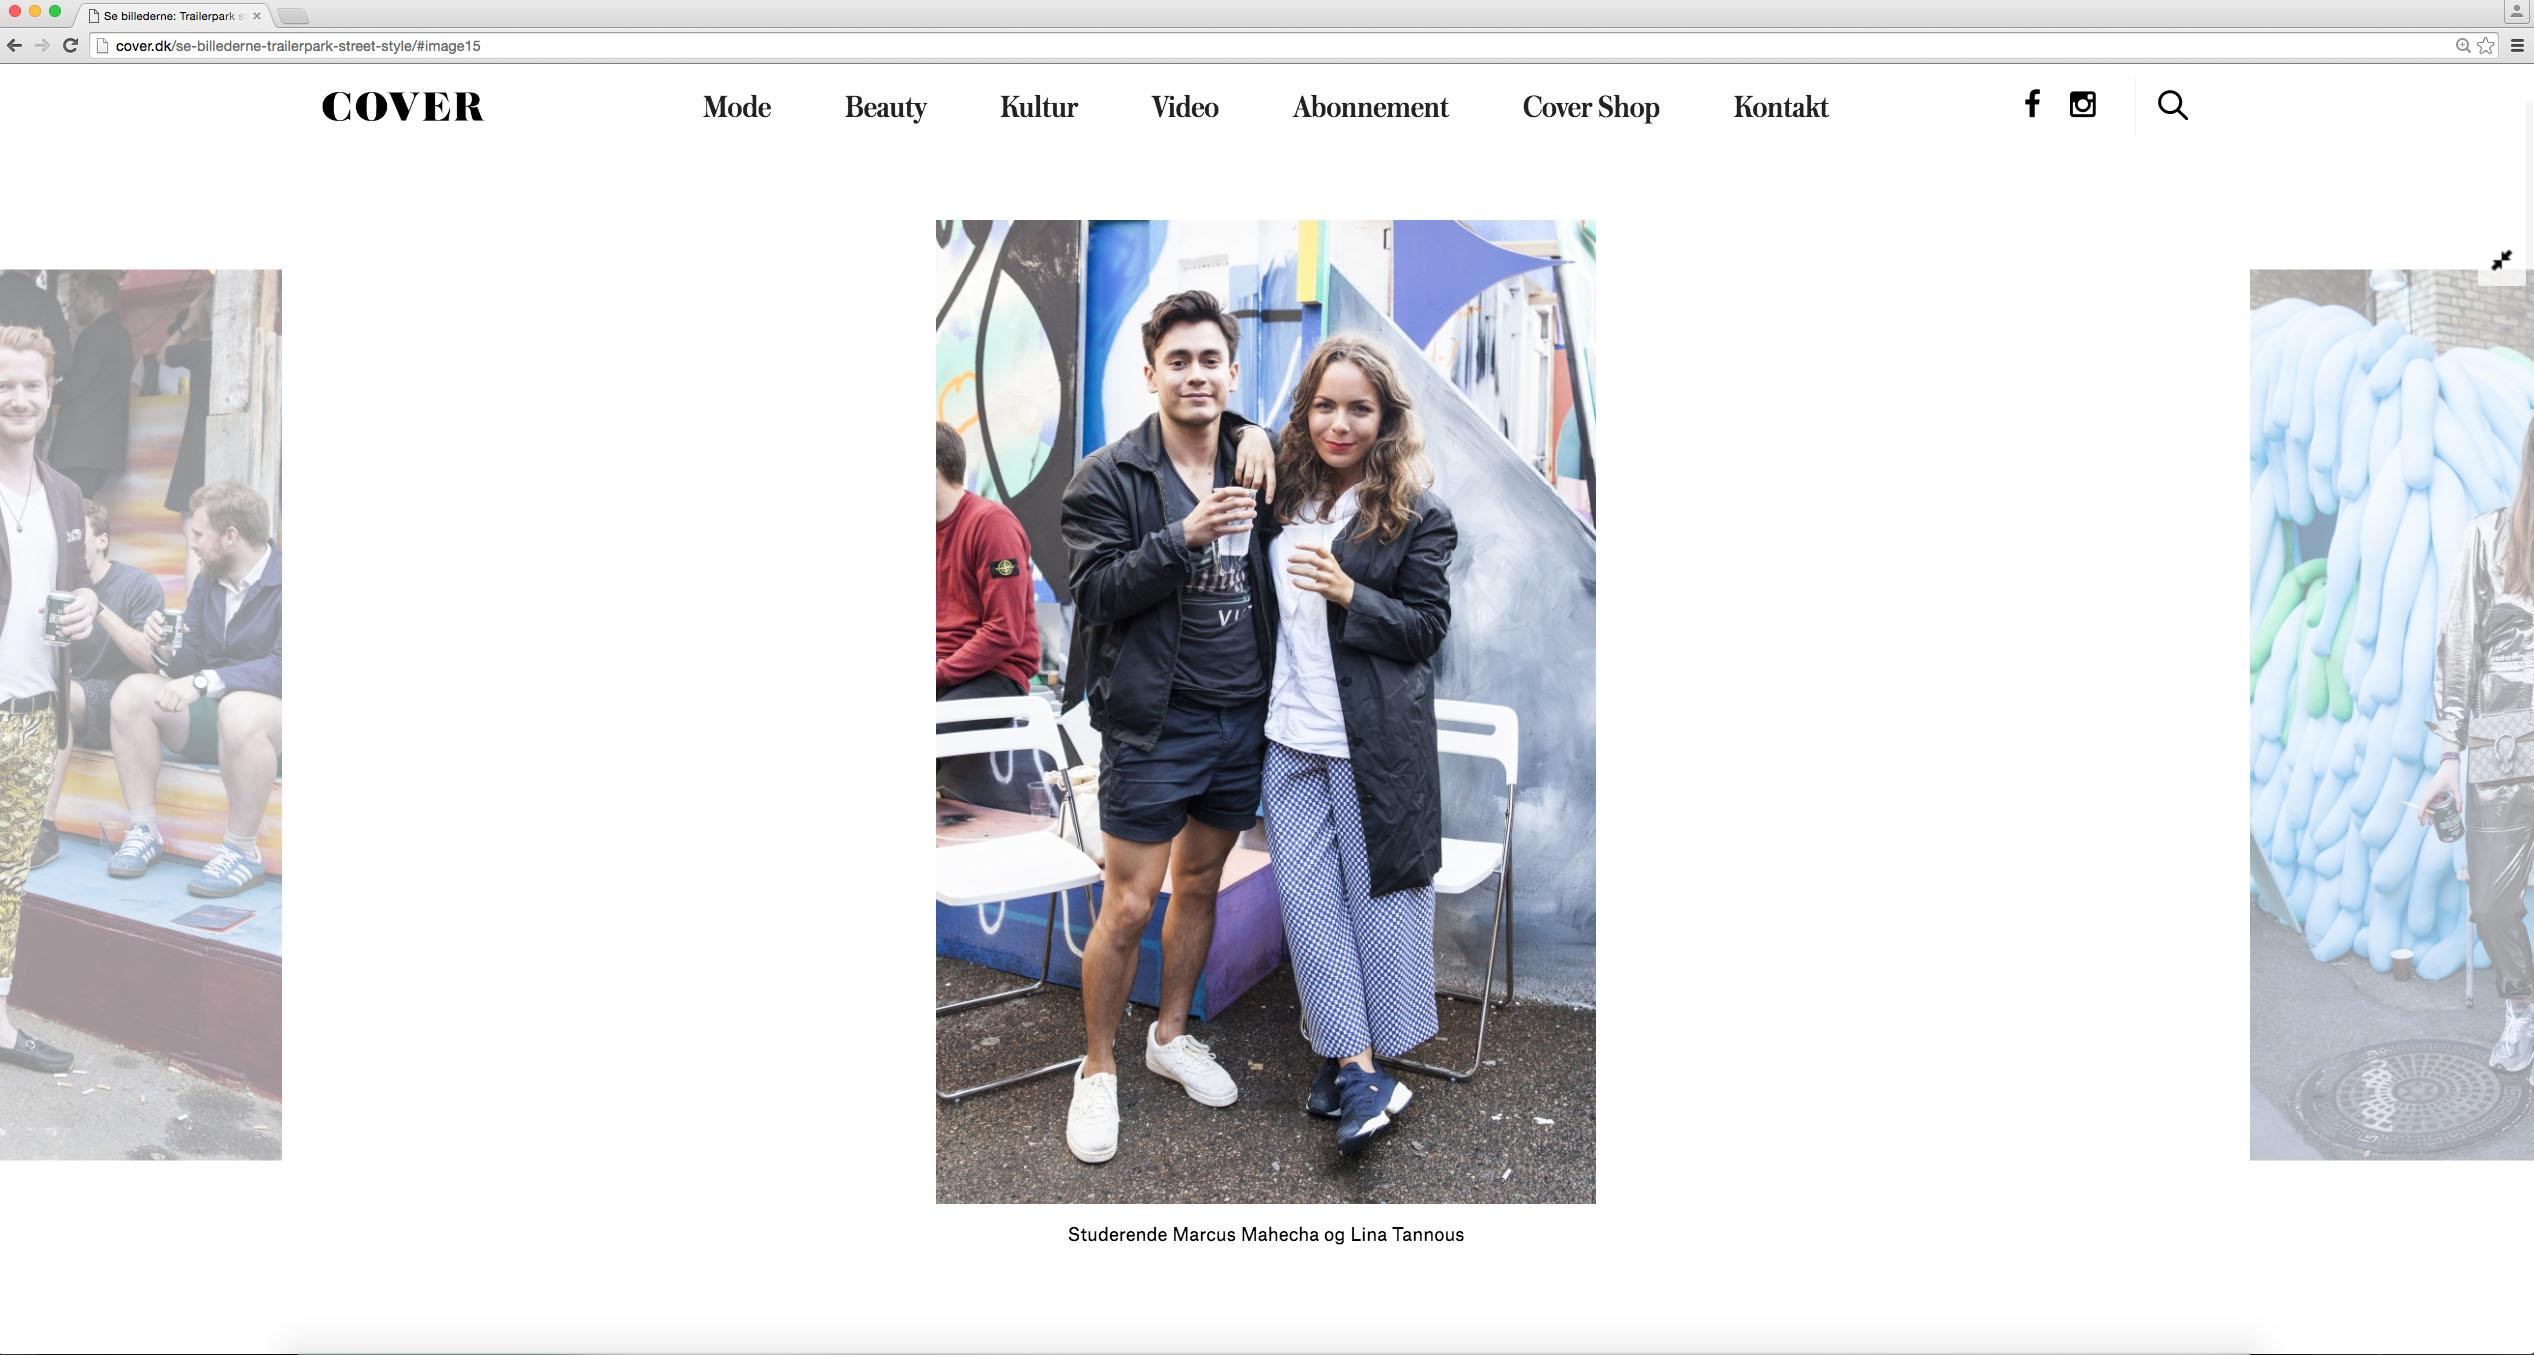 Streetstyle_CoverMagazine_TrailerparkFestival2016_15